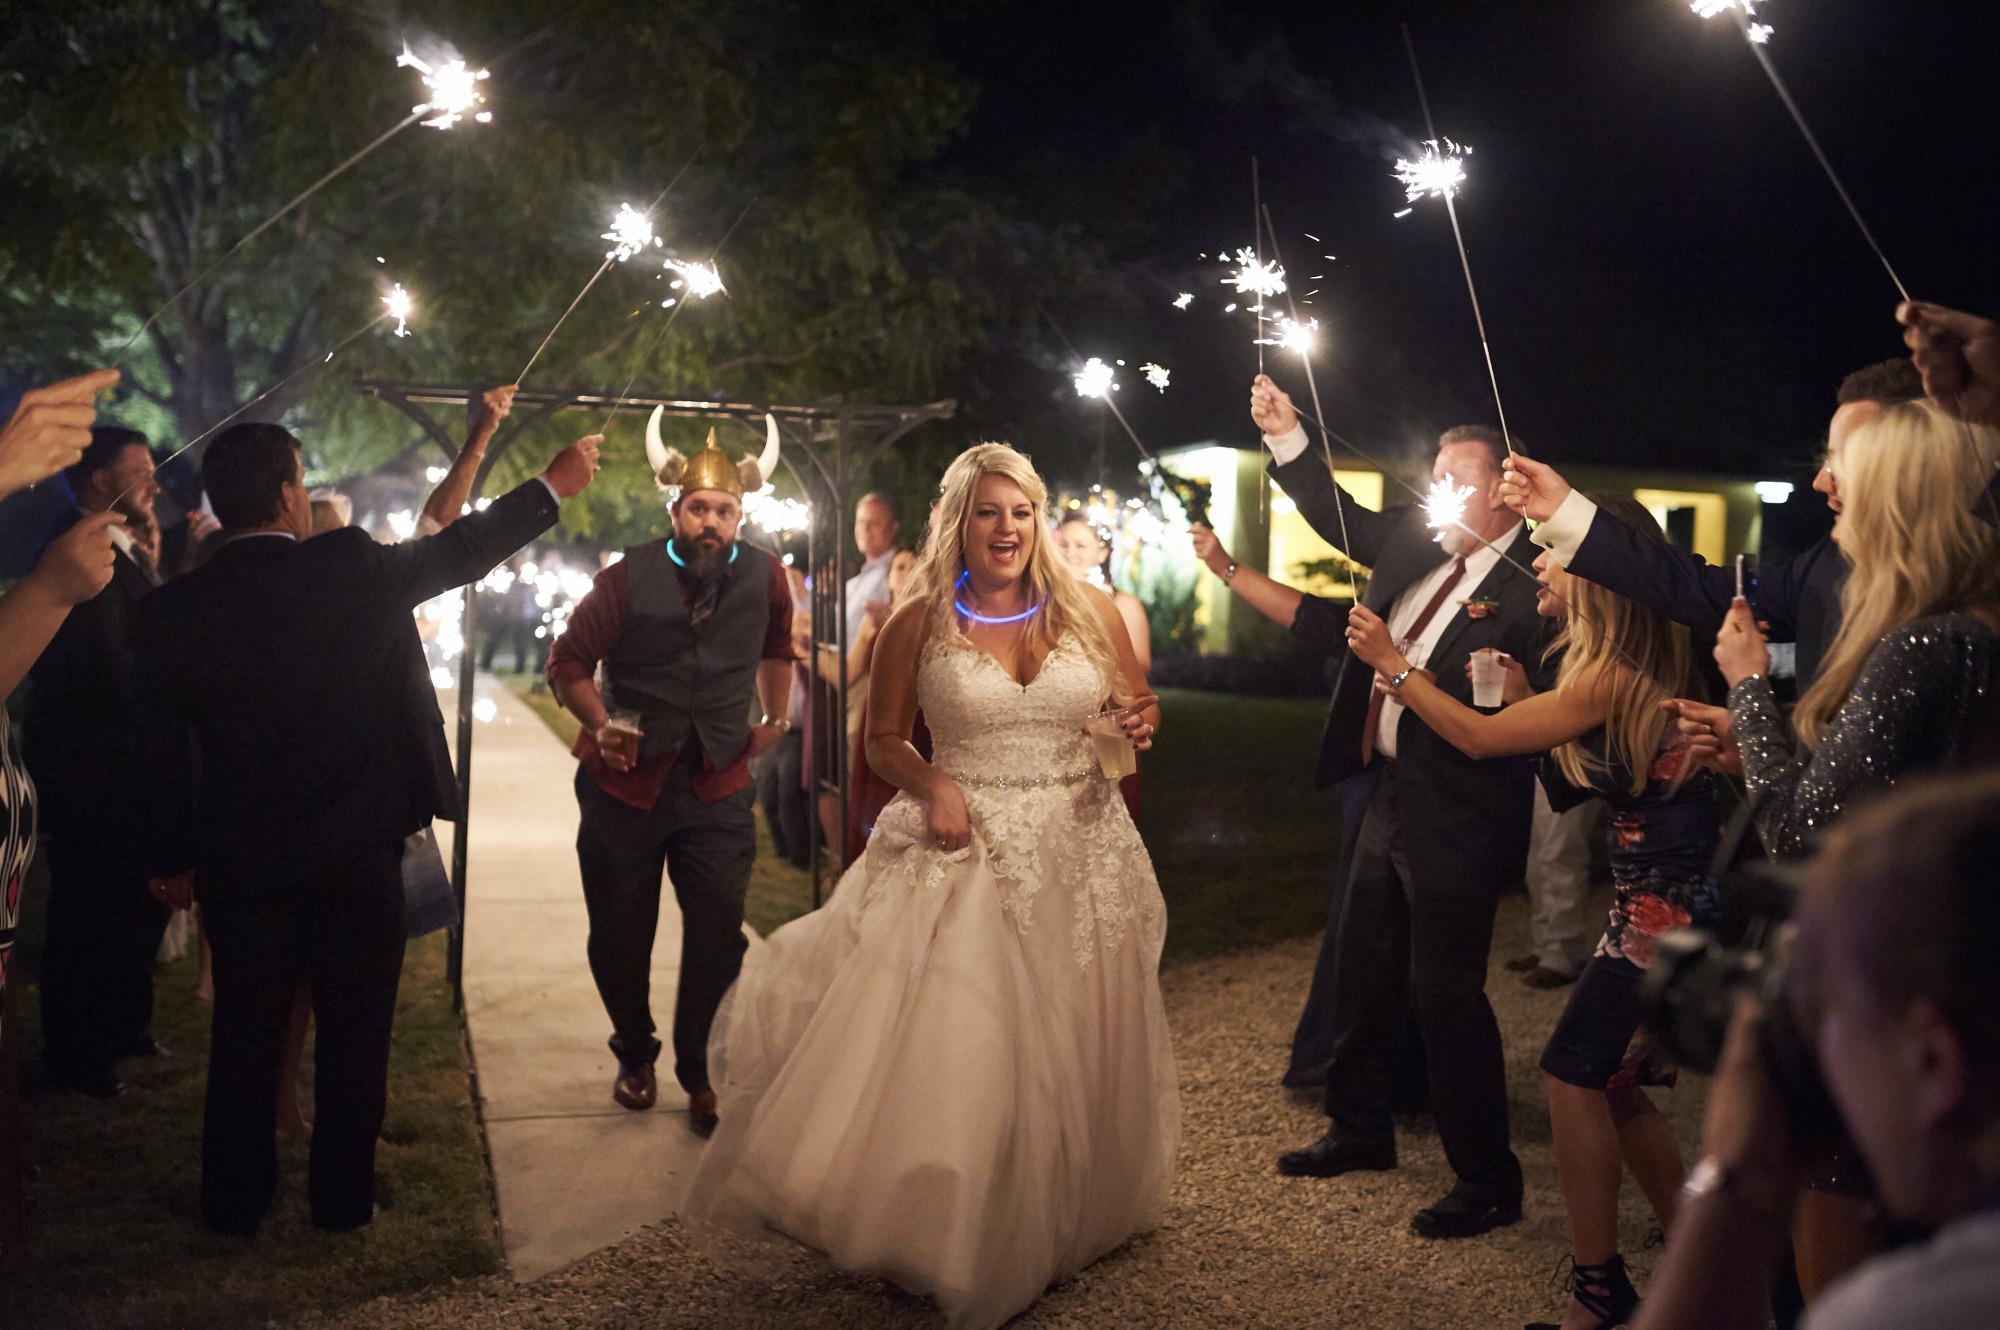 Taylor and Cody - Taylor Mansion and Crystal Ball Room - Taylor Texas - Wedding - 046